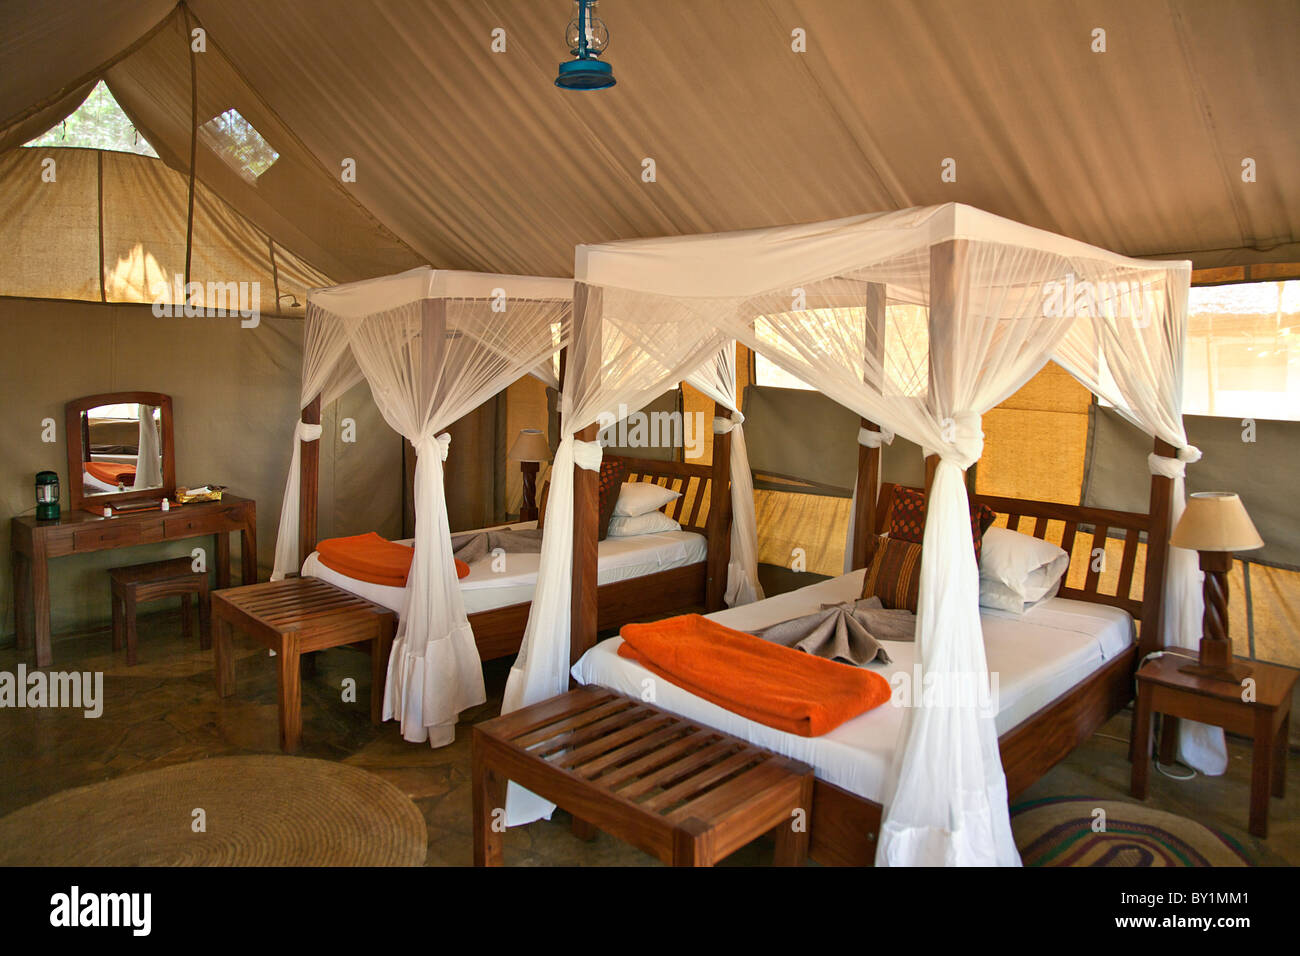 Überdachter Unterkunft im Selous Riverside Safari Camp am Ufer des Rufiji Flusses Toren Selous Spiel Stockbild